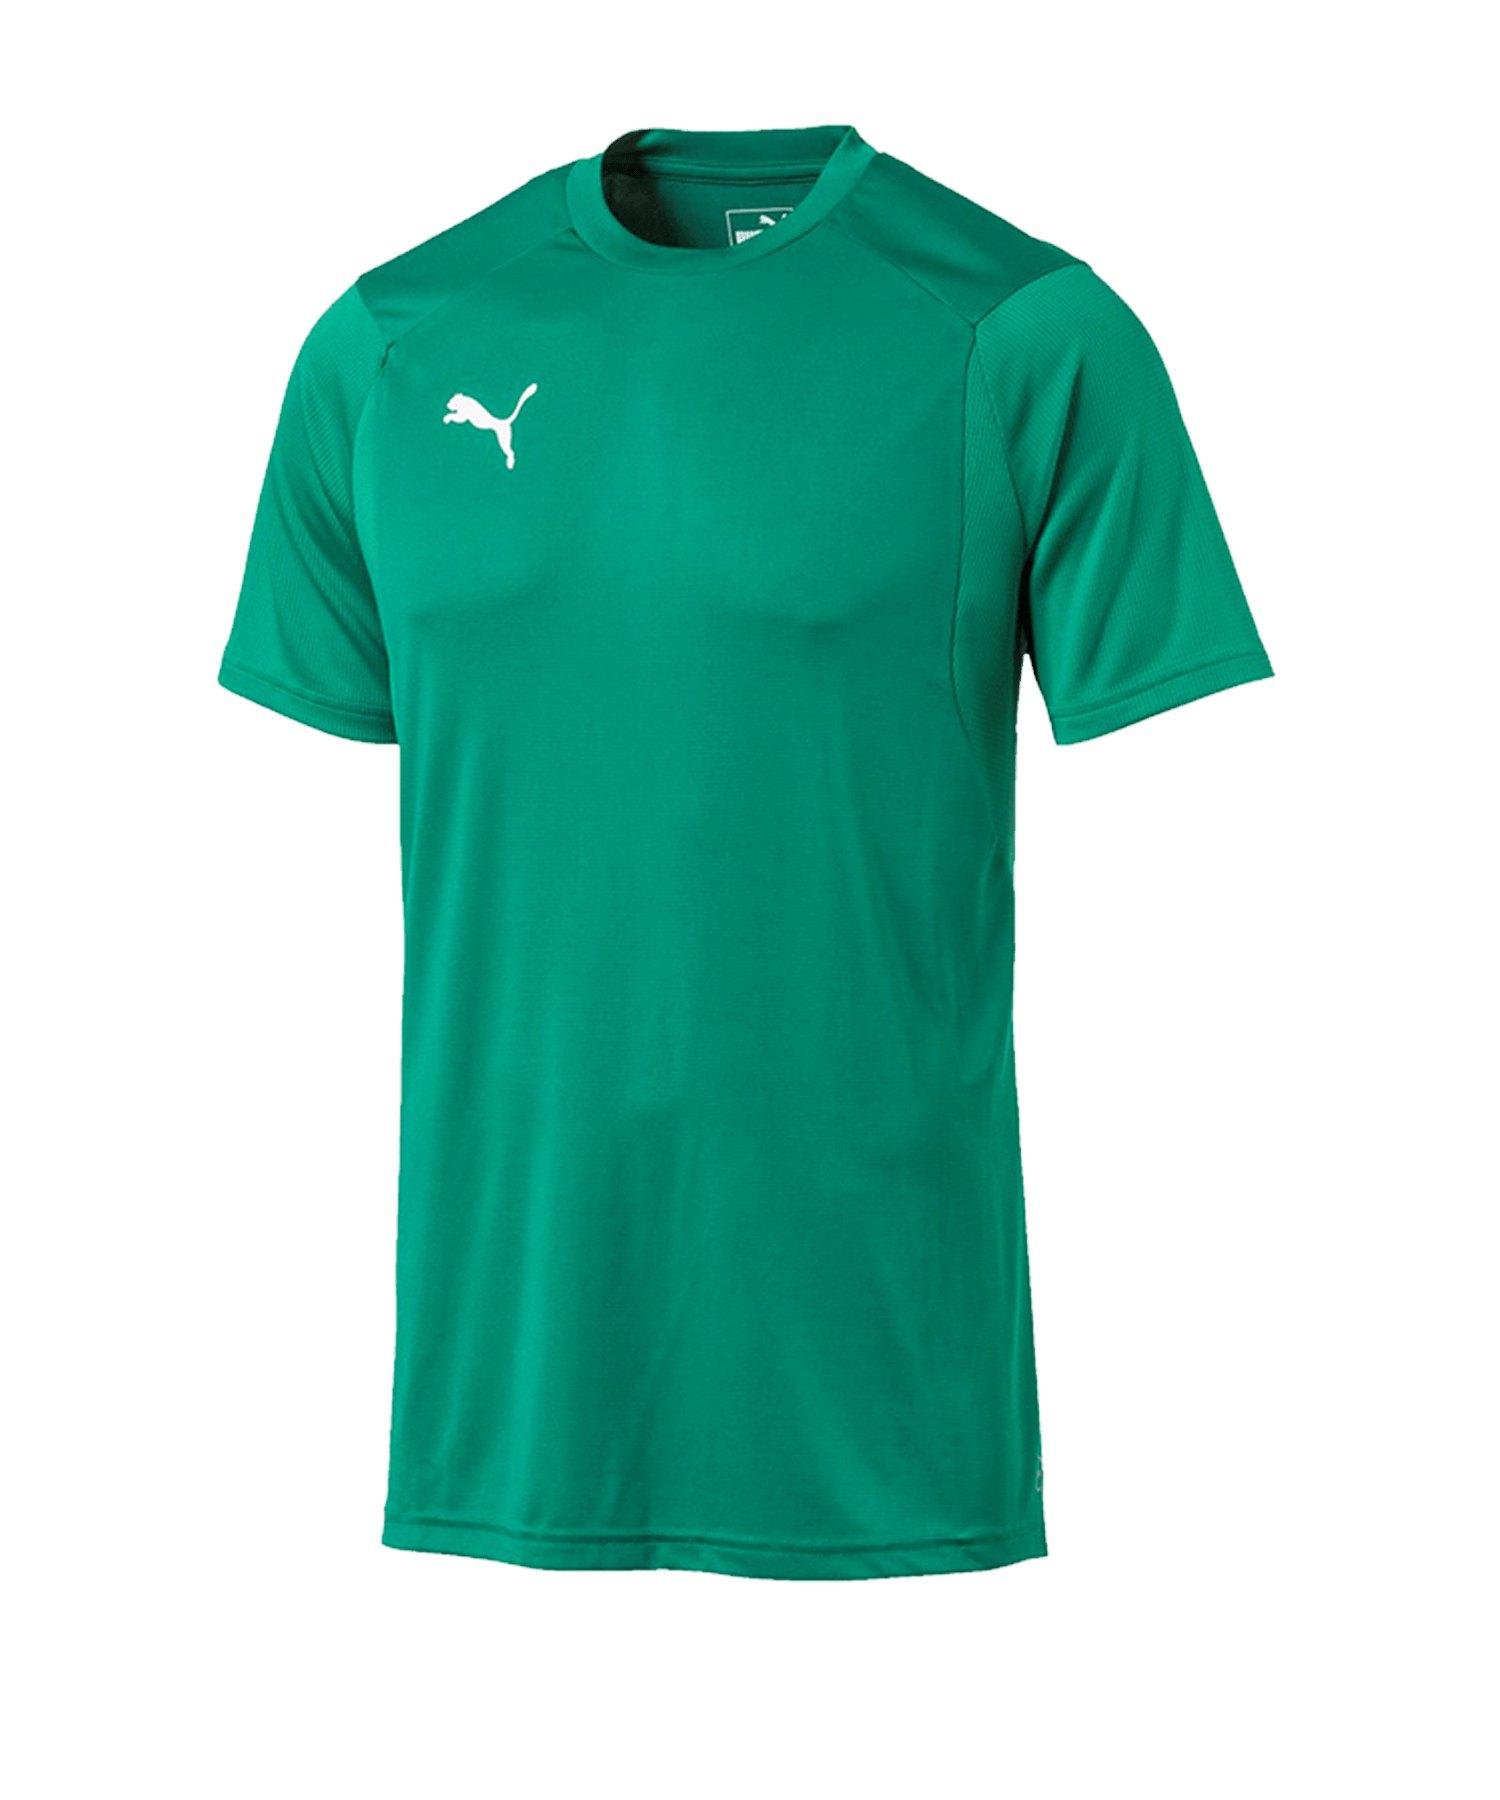 PUMA LIGA Training T-Shirt Grün F05 - gruen